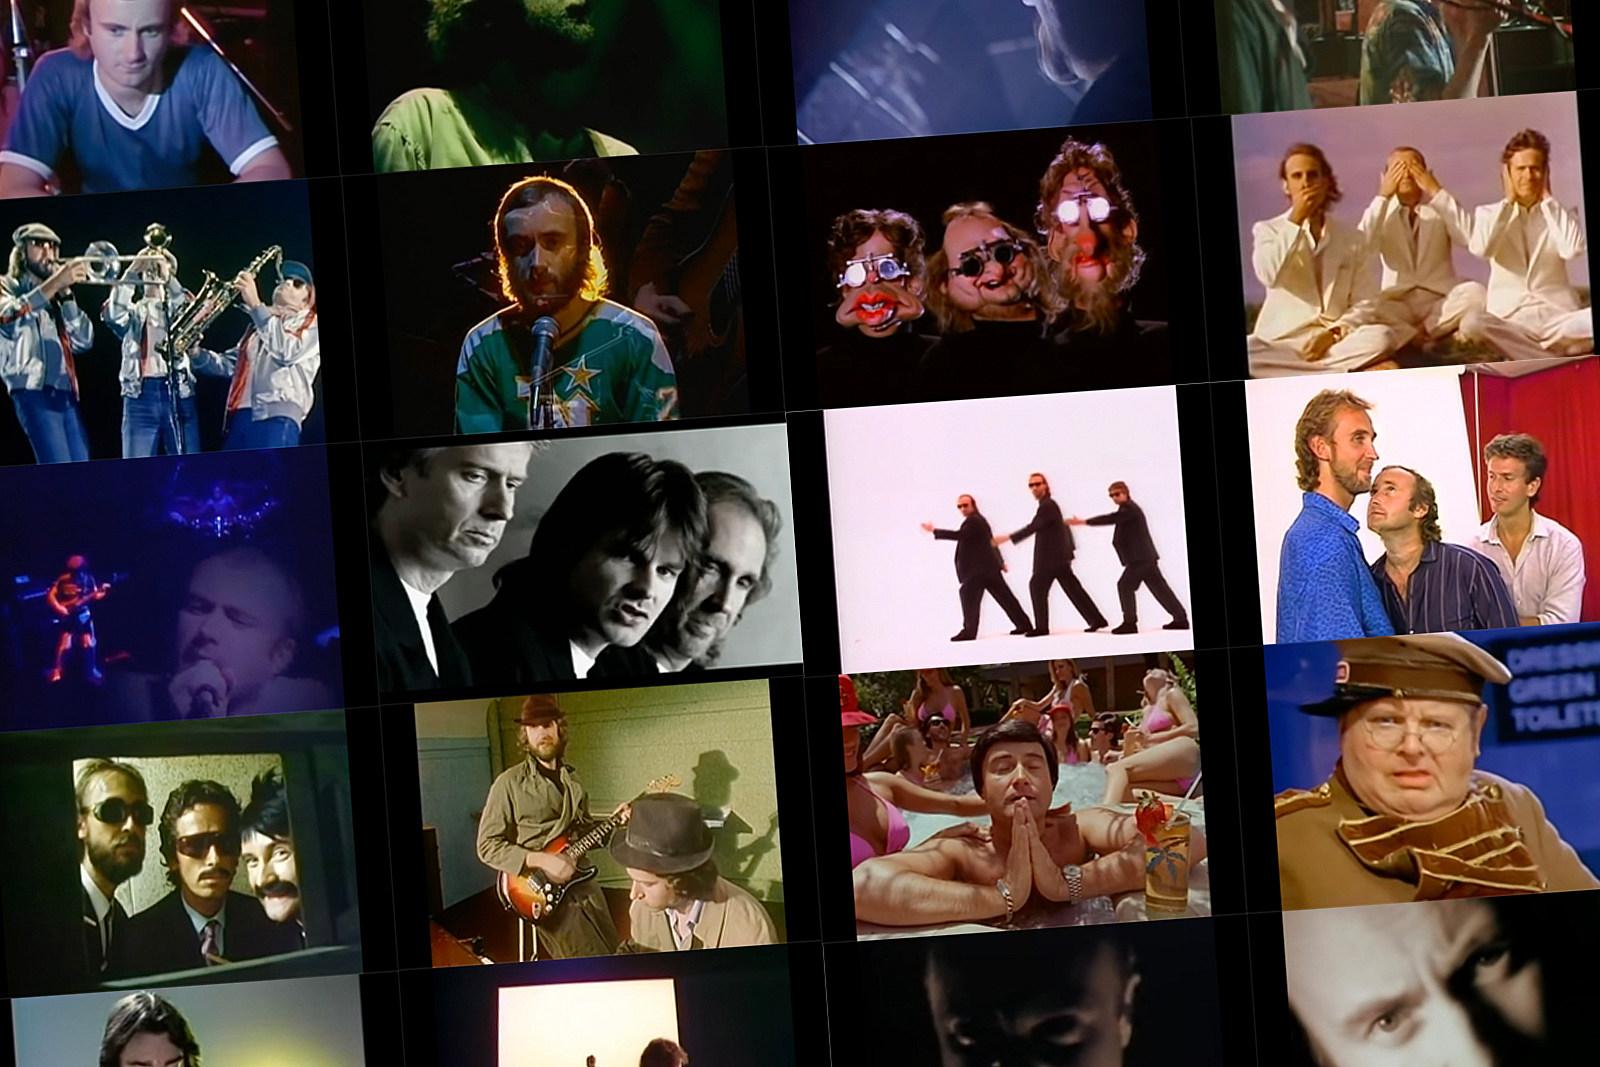 All 32 Genesis Music Videos Ranked Worst to Best